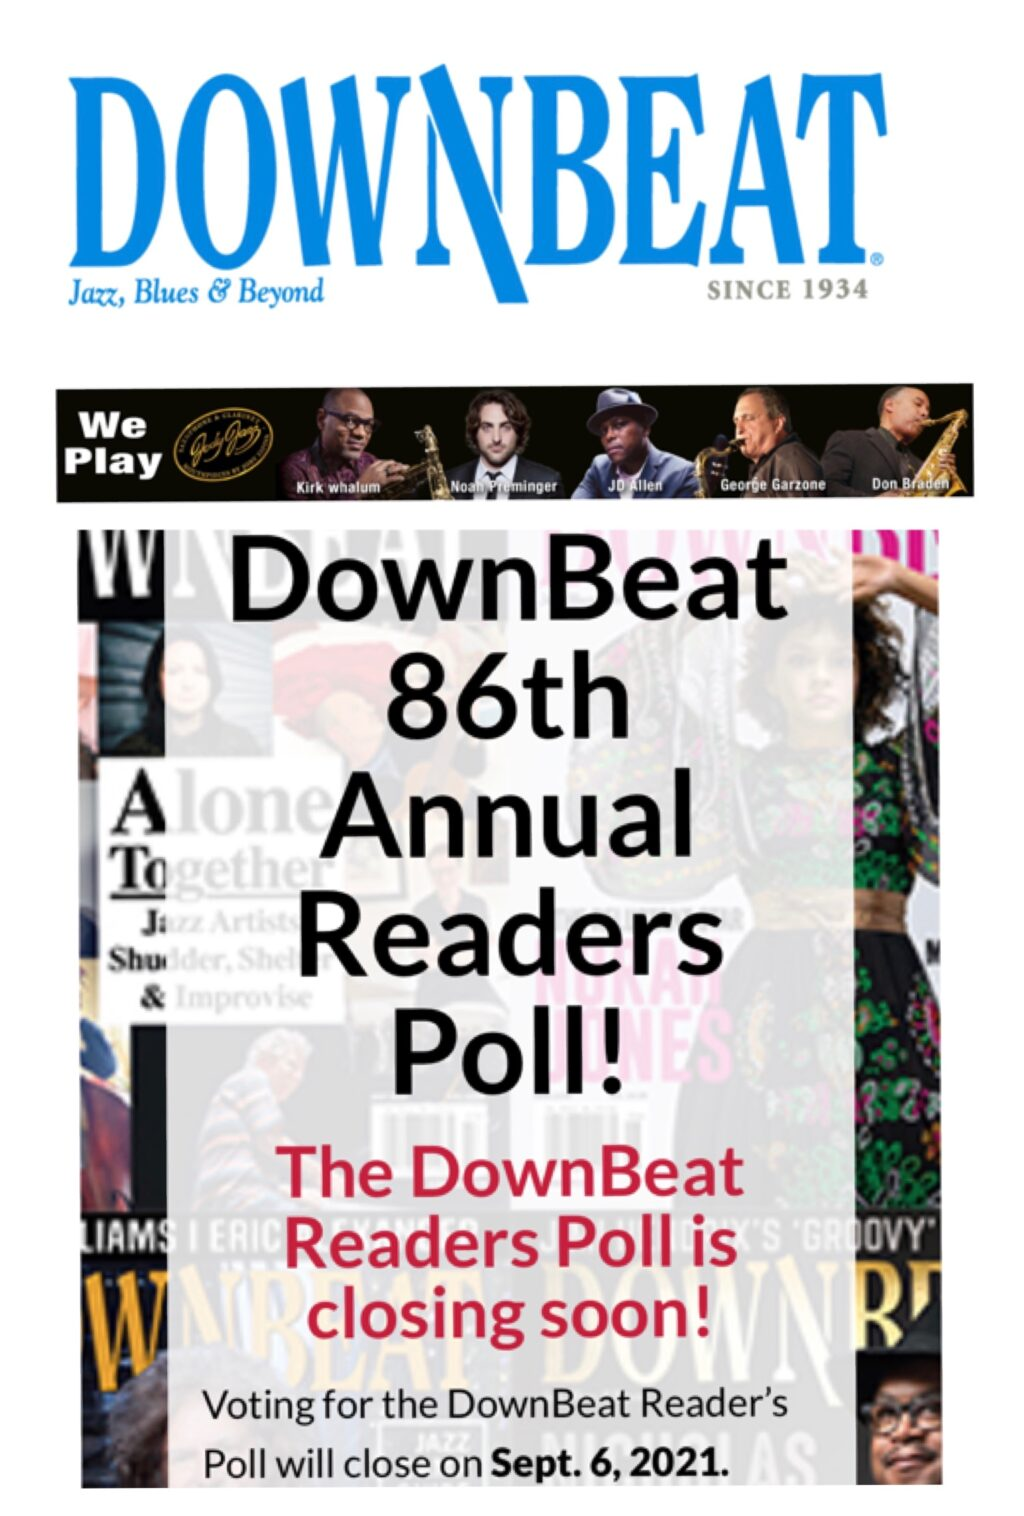 Vote for Yoko Miwa in the Downbeat Readers Poll